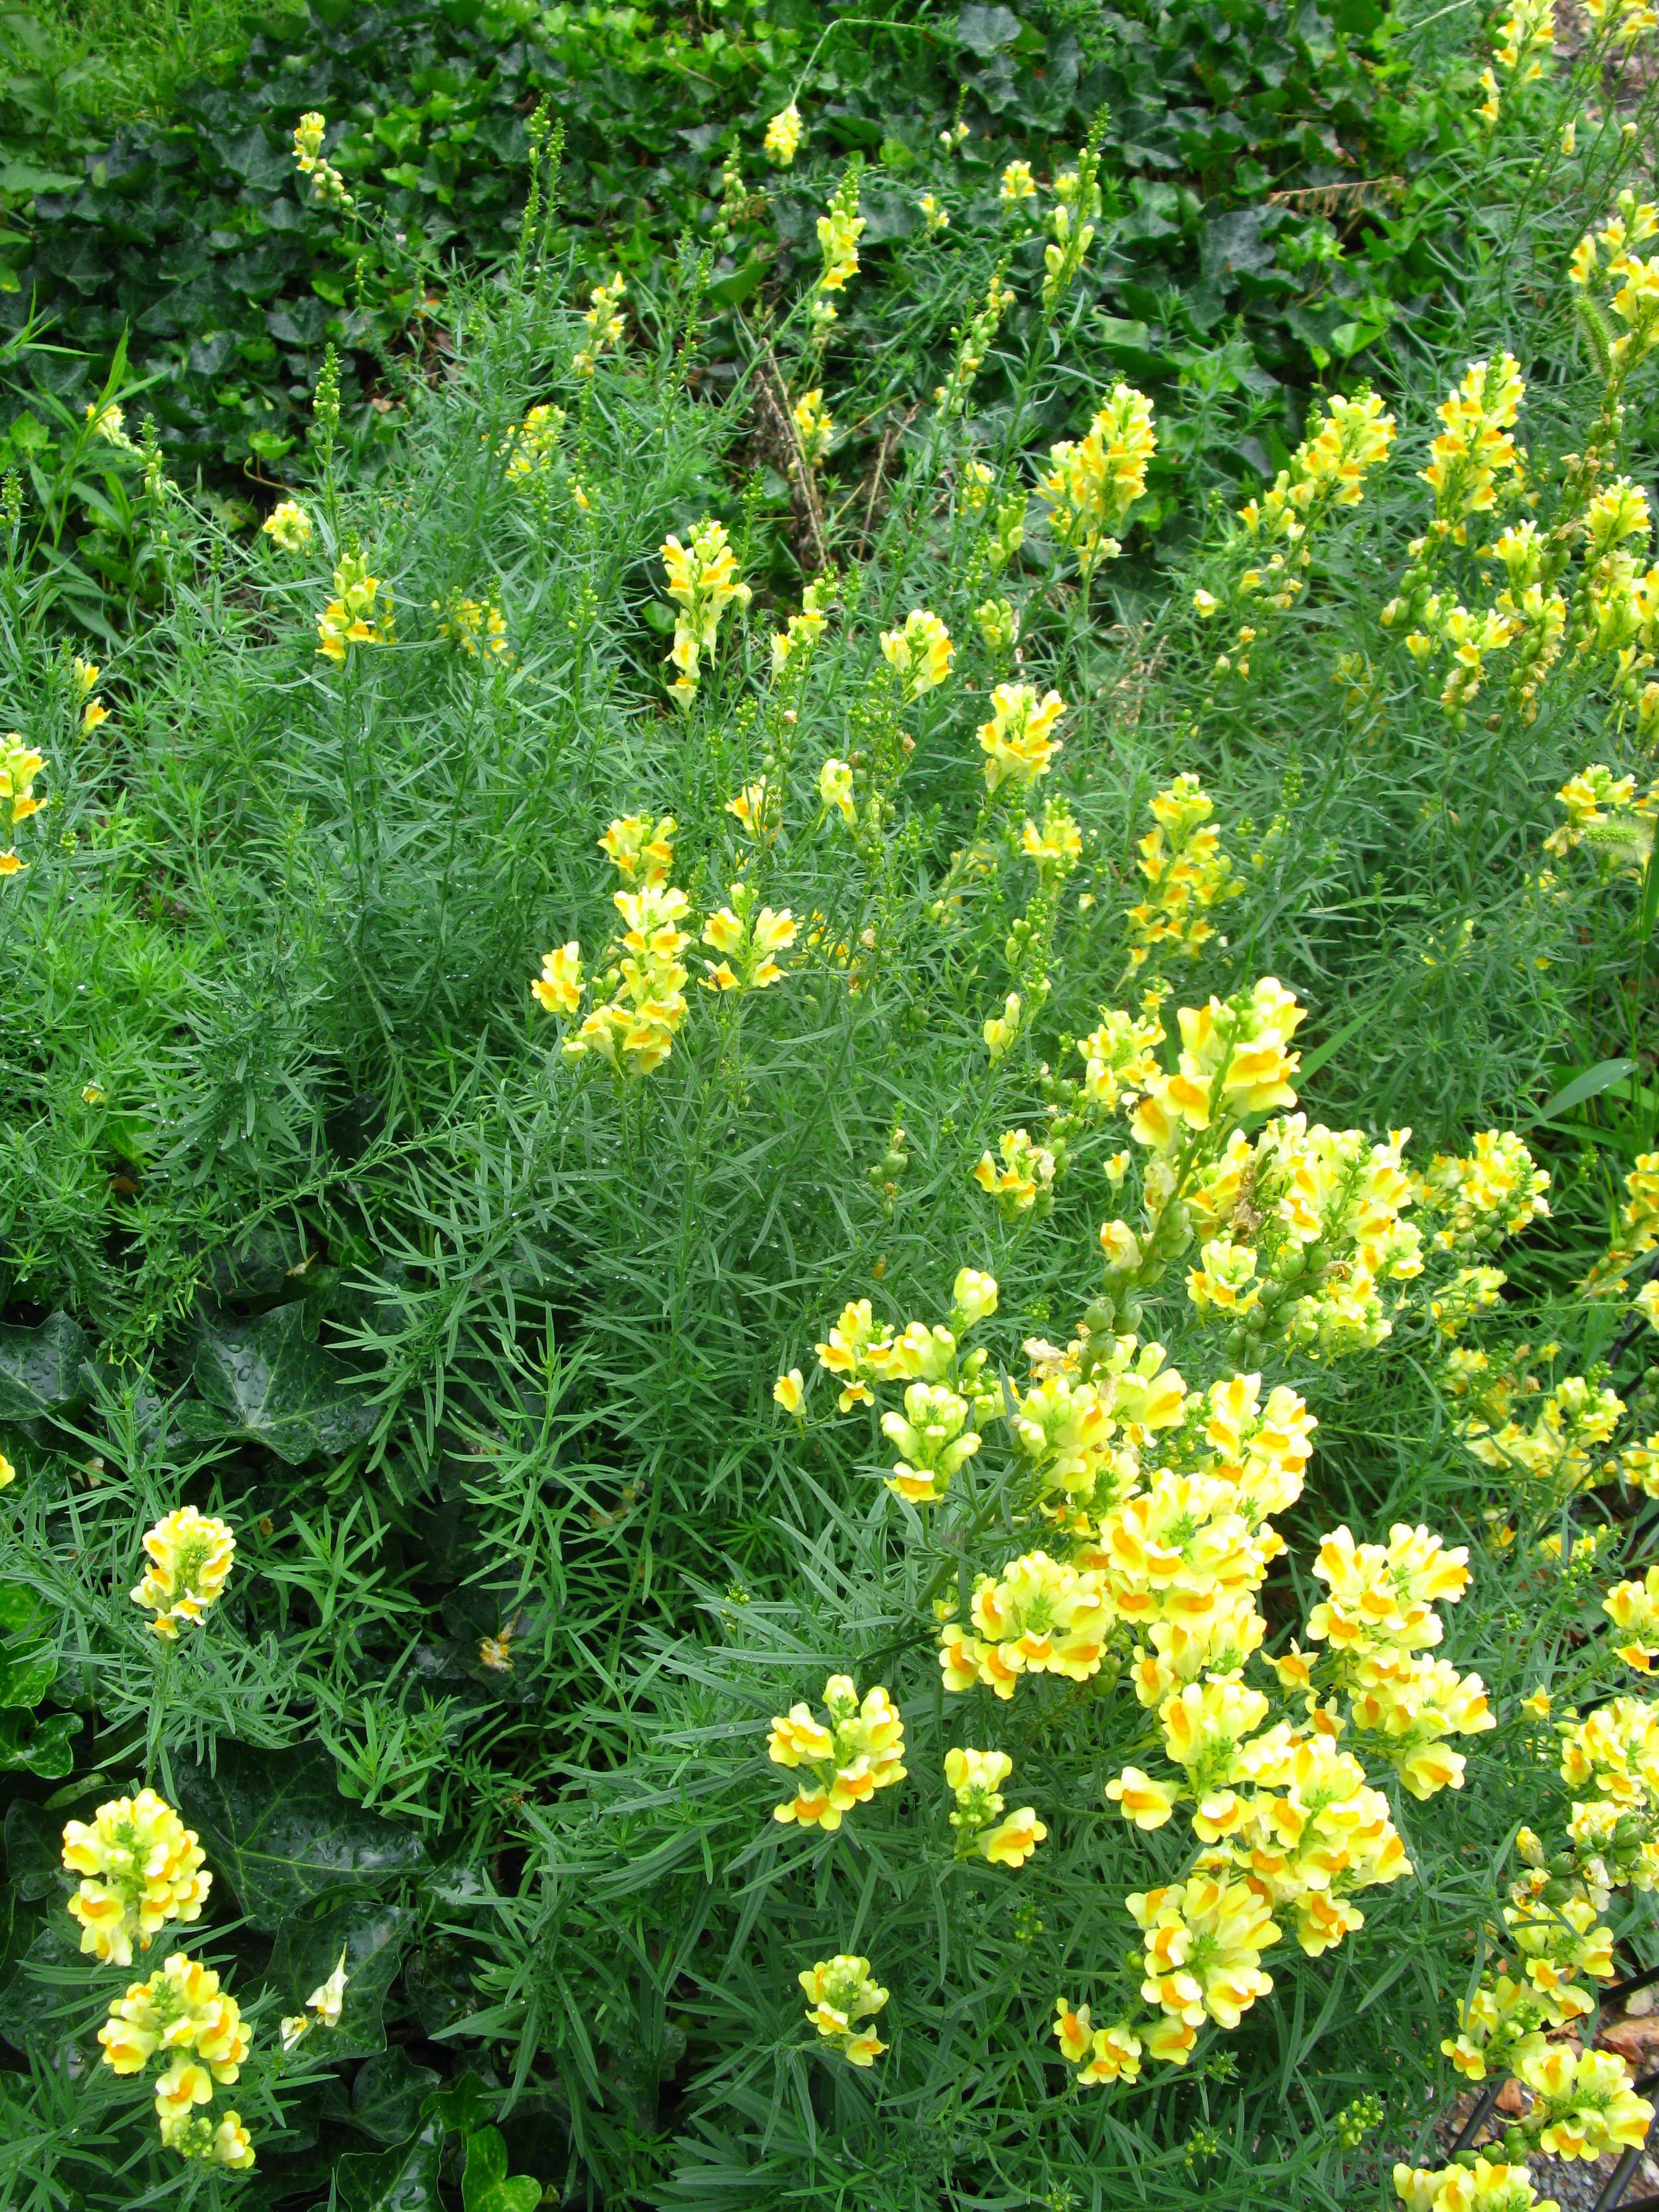 Linaria vulgaris Scrophulariaceae